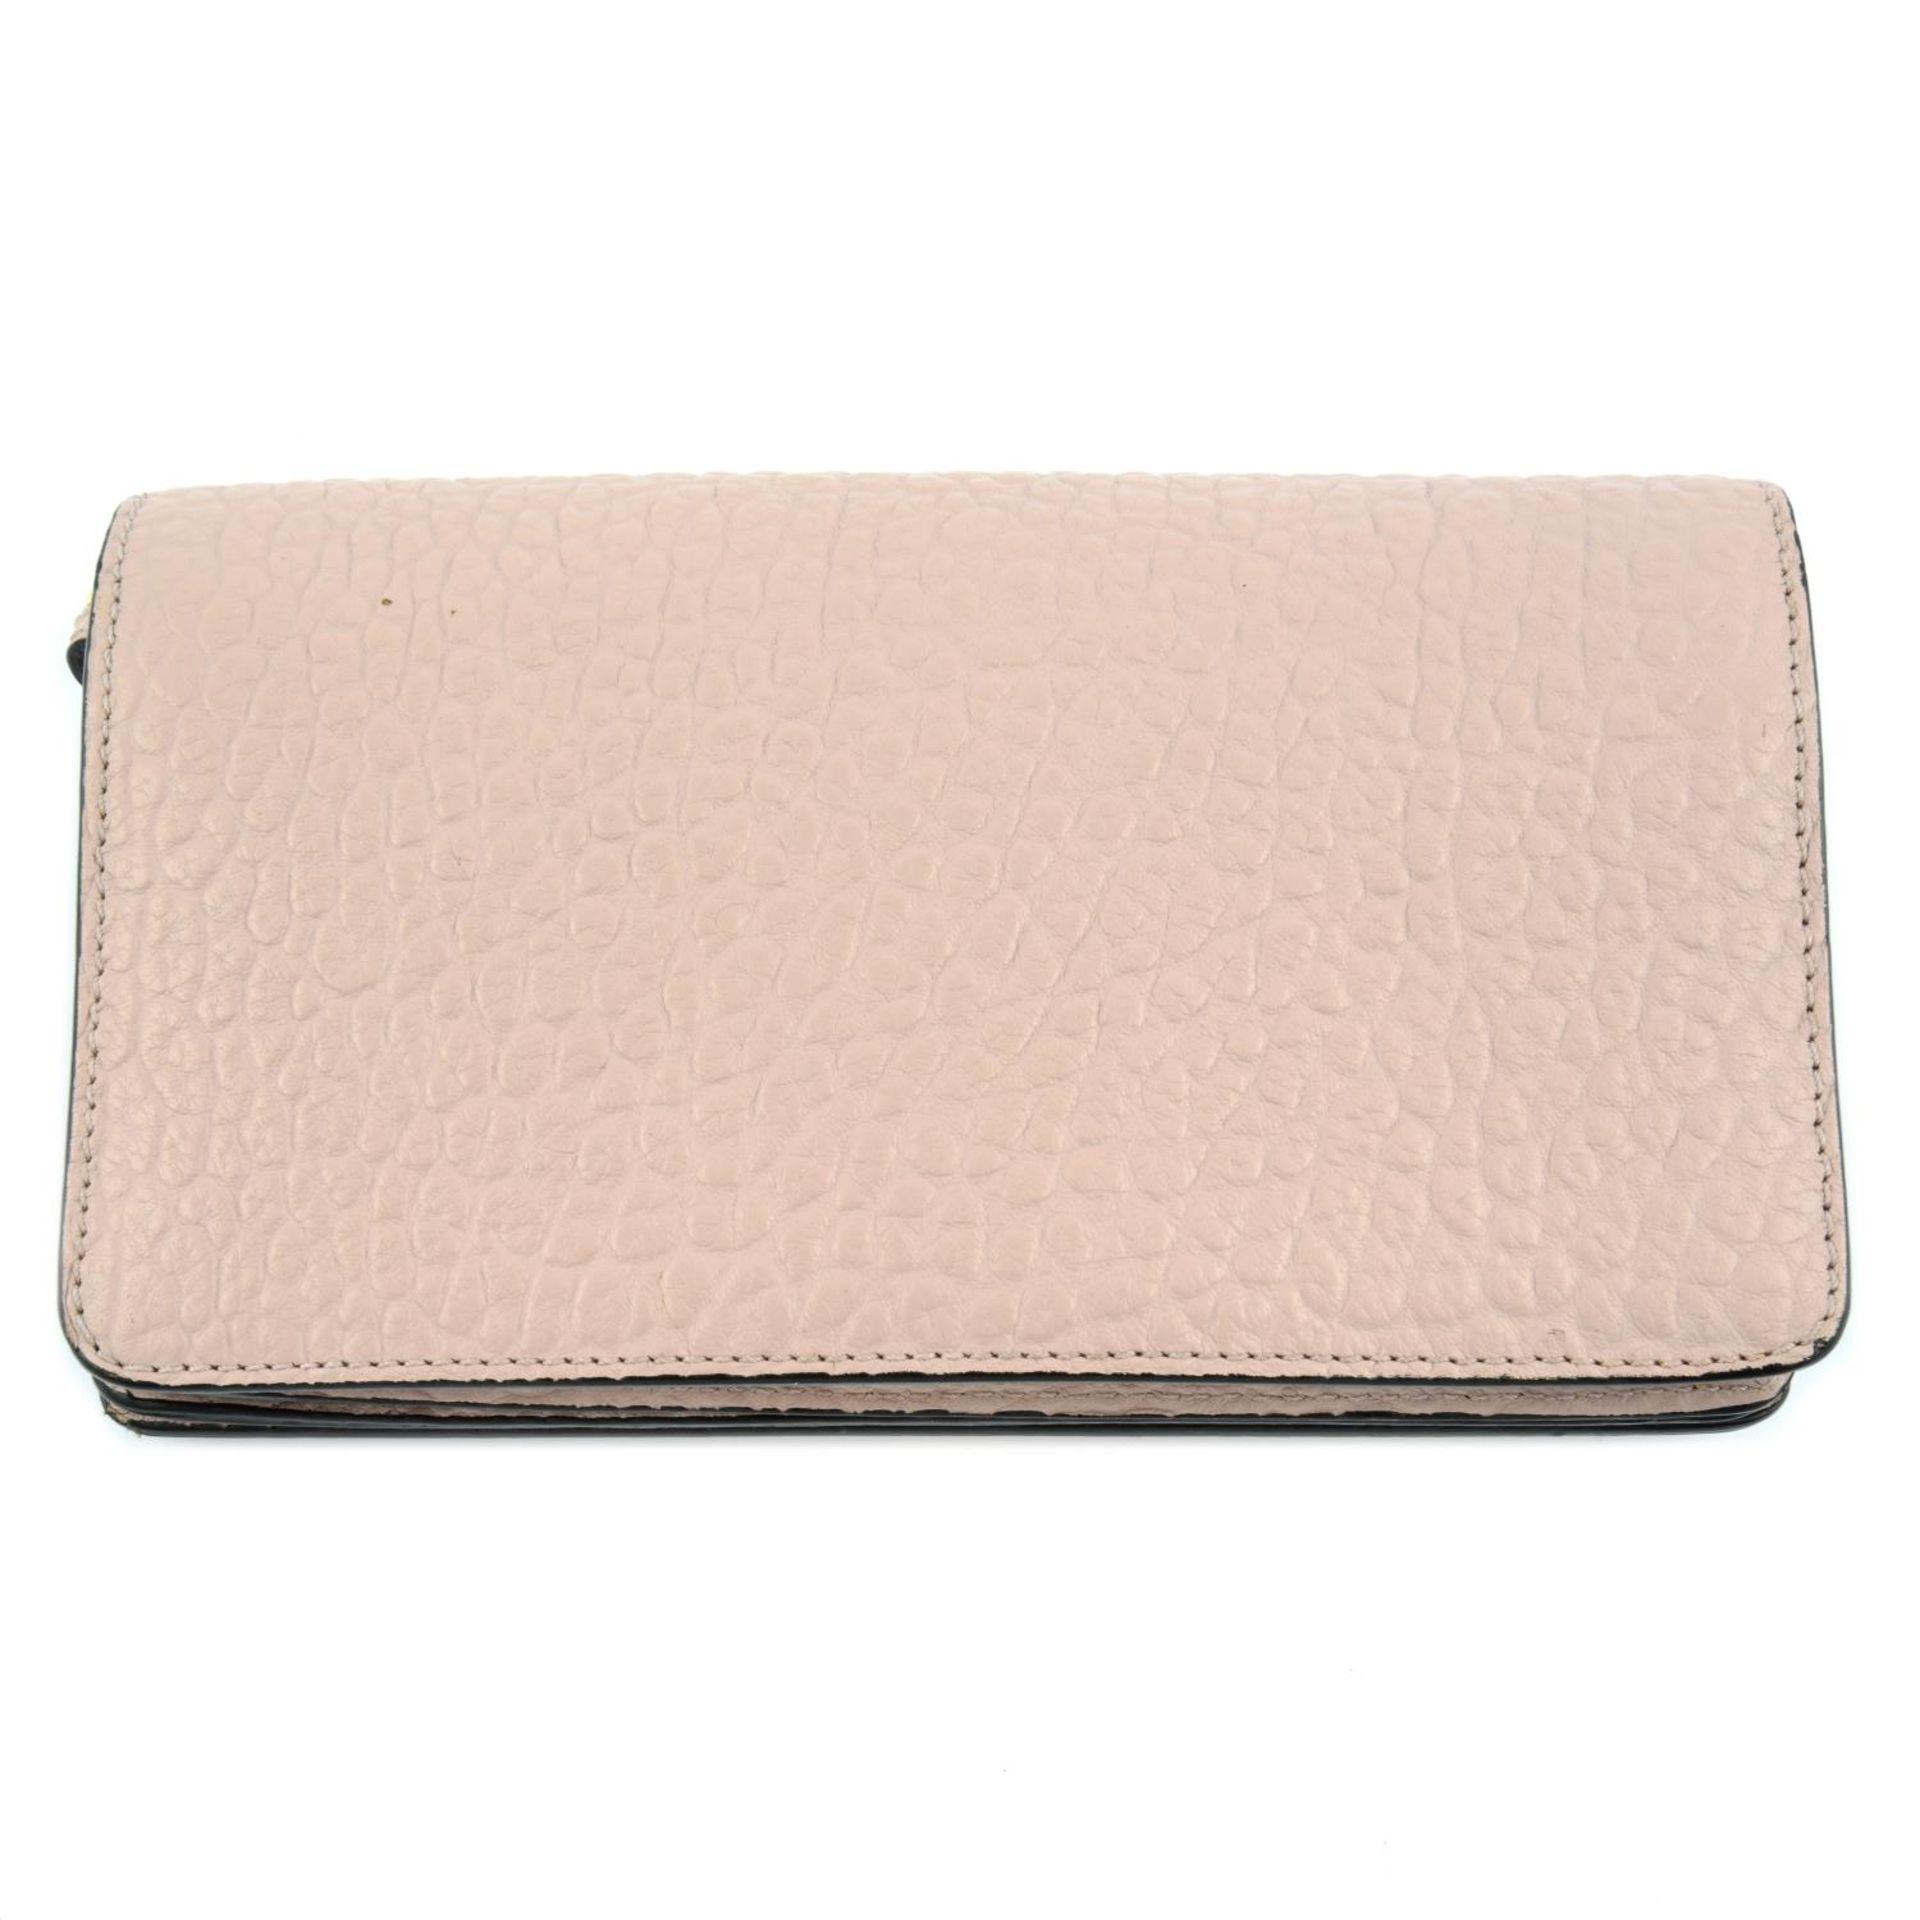 BURBERRY - pink Madison Wallet On Chain handbag. - Image 2 of 5